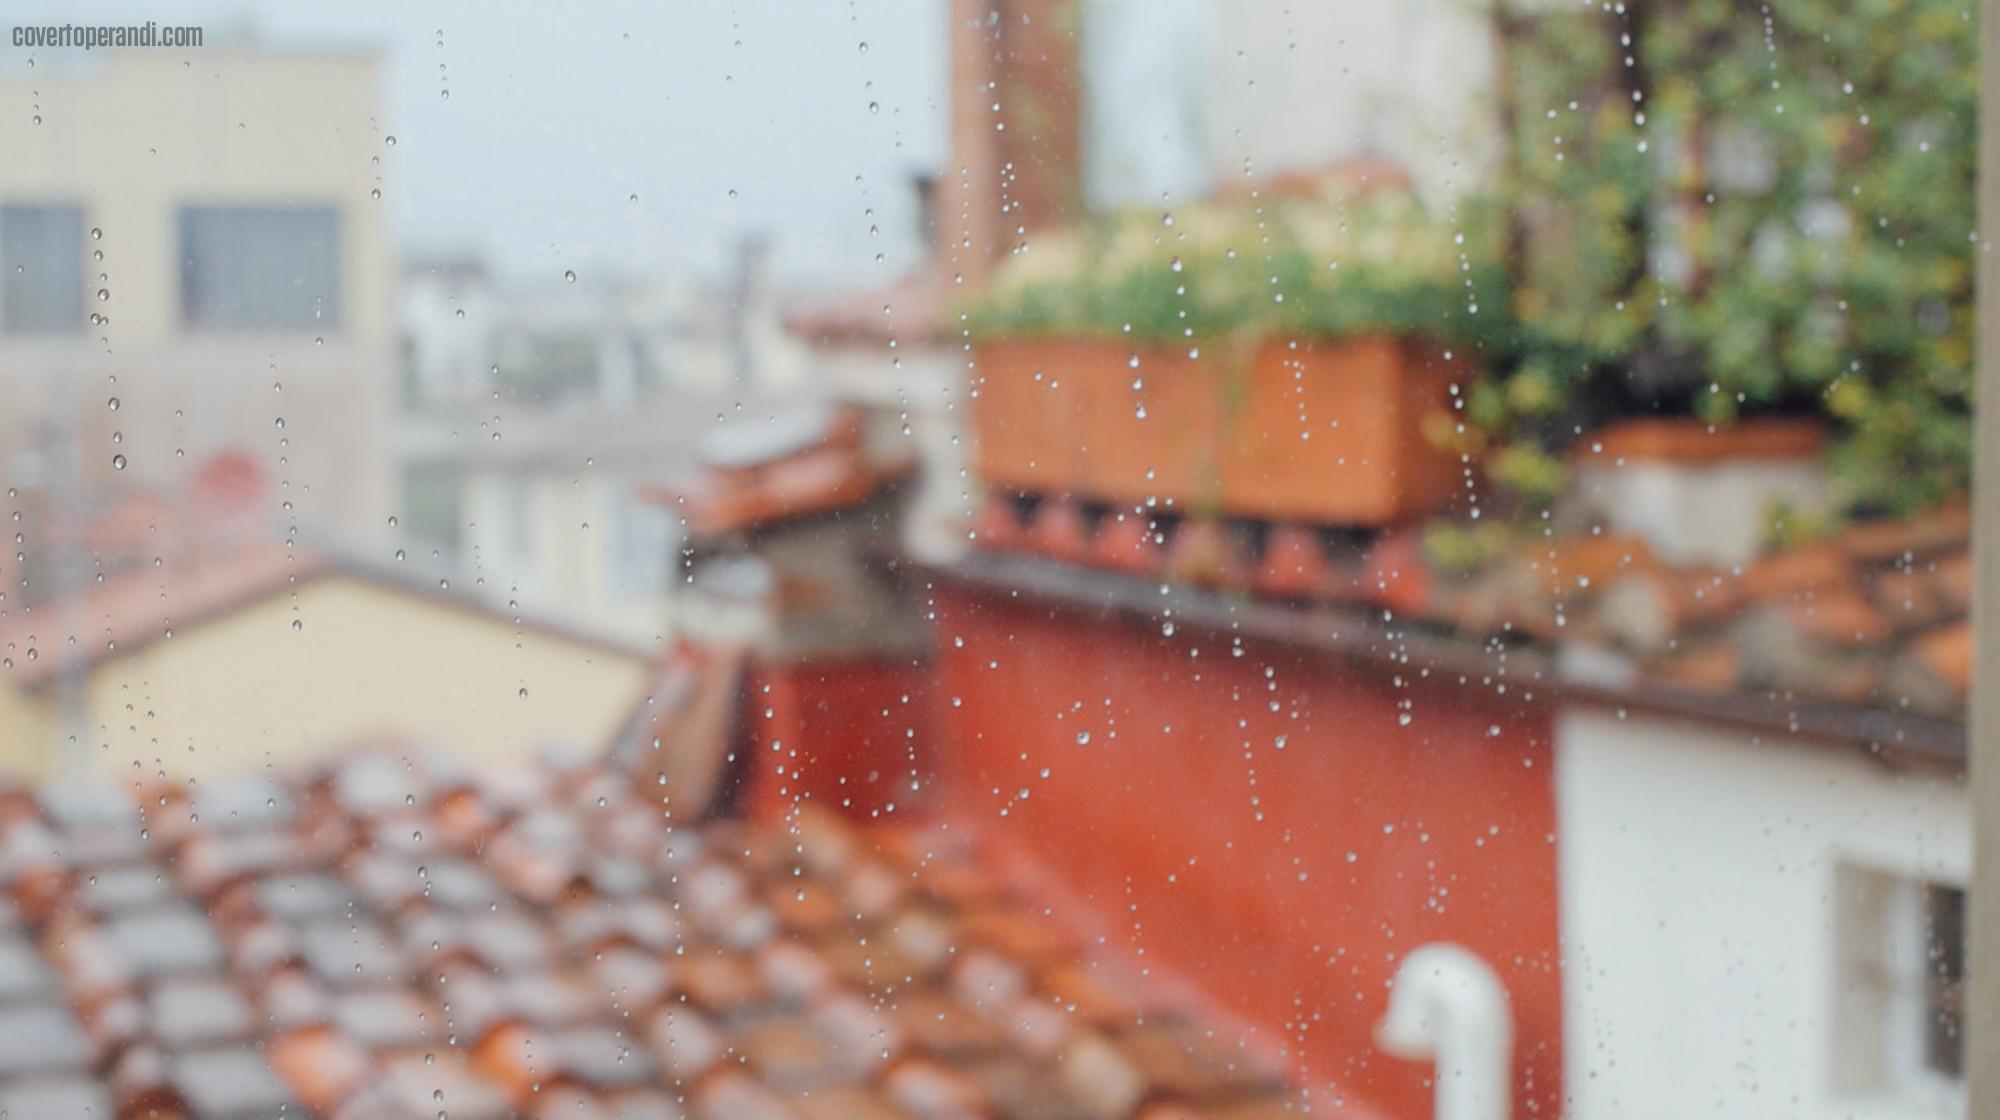 Covert Operandi - 2014 Florence-21.jpg